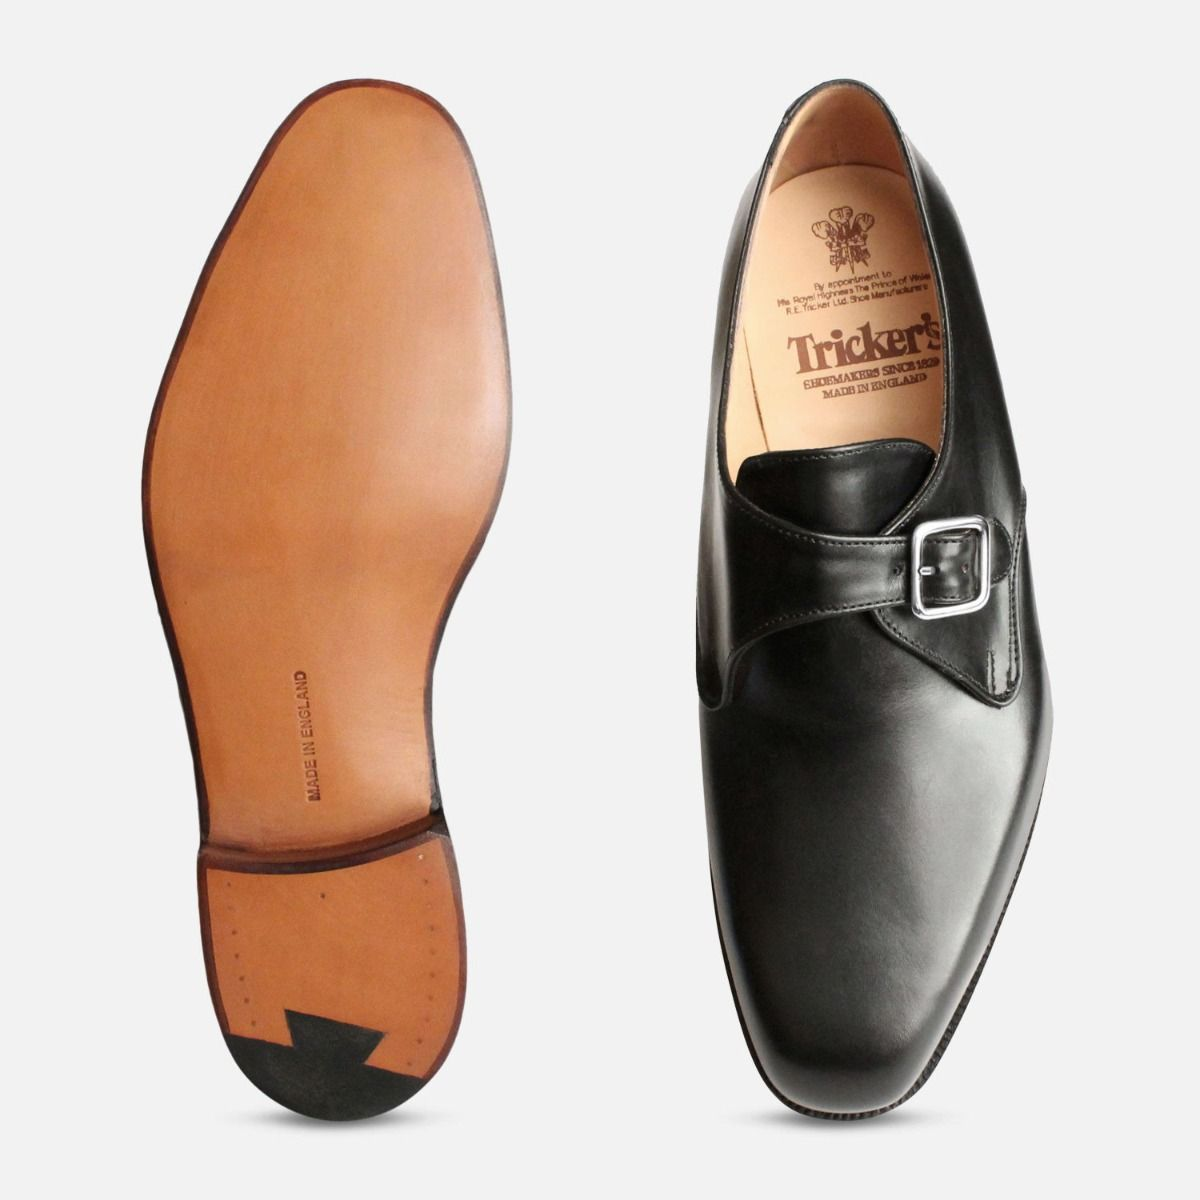 Mayfair Black Buckle Monk Trickers Shoes